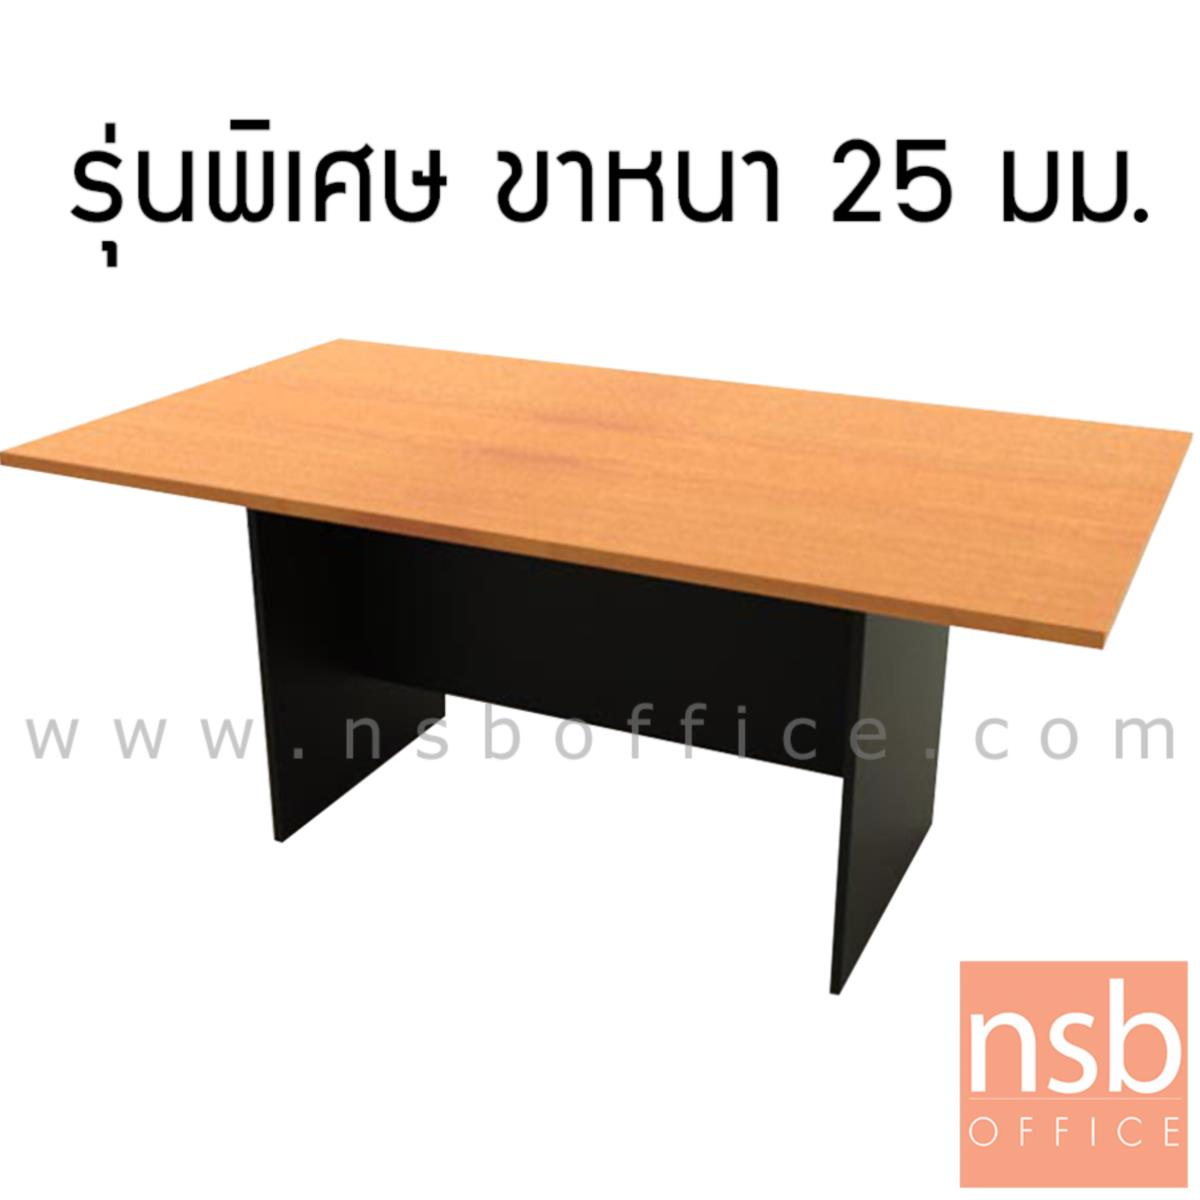 A05A052:โต๊ะประชุมทรงสี่เหลี่ยม  รุ่น Seaton (ซีตัน) 6 ,8 ,10 ที่นั่ง ขนาด 165W ,180W ,200W ,240W cm.  เมลามีน